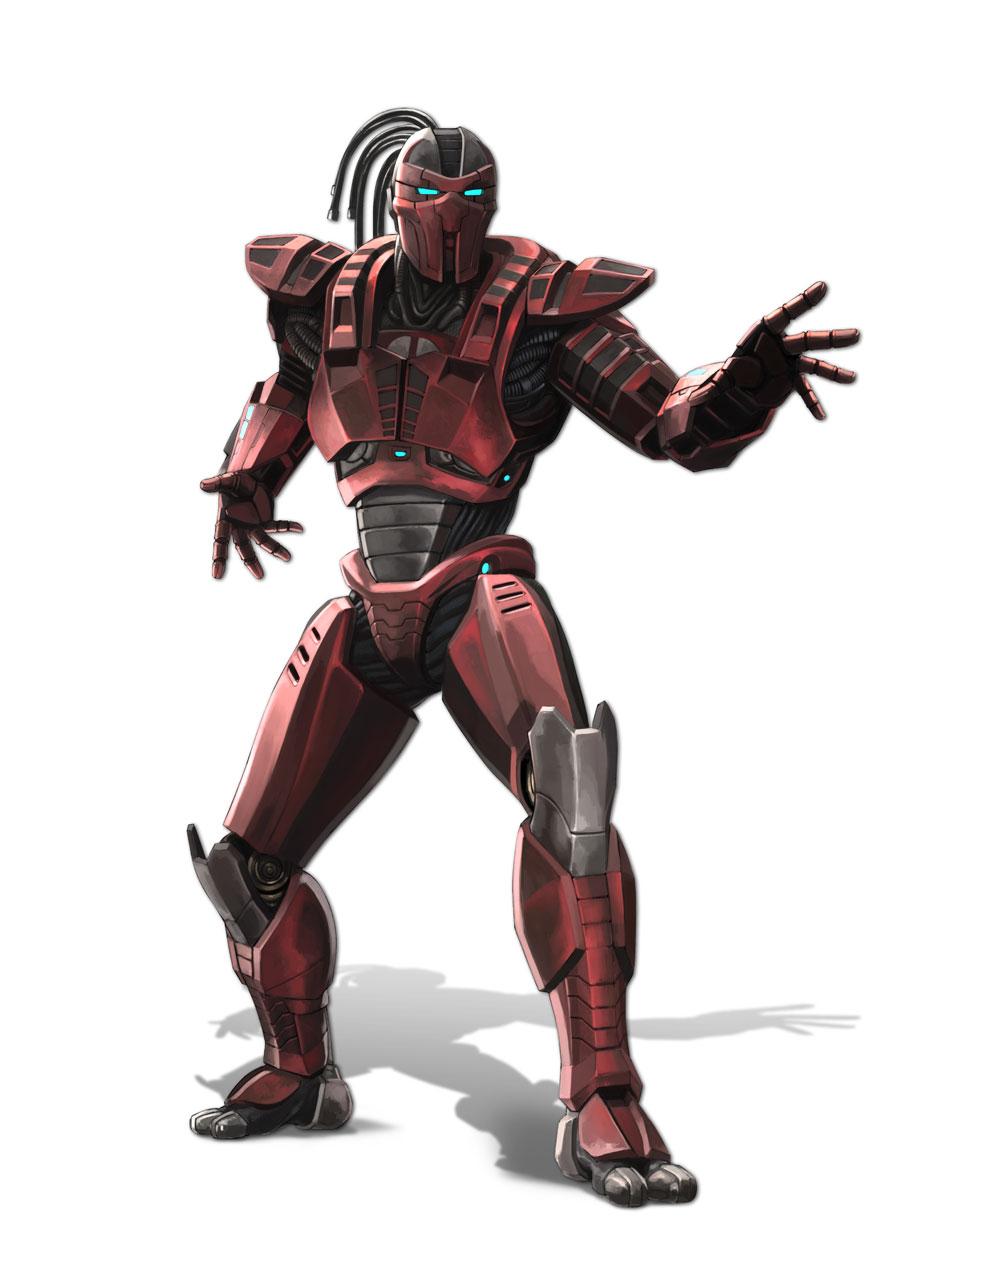 Sektor (Mortal Kombat)